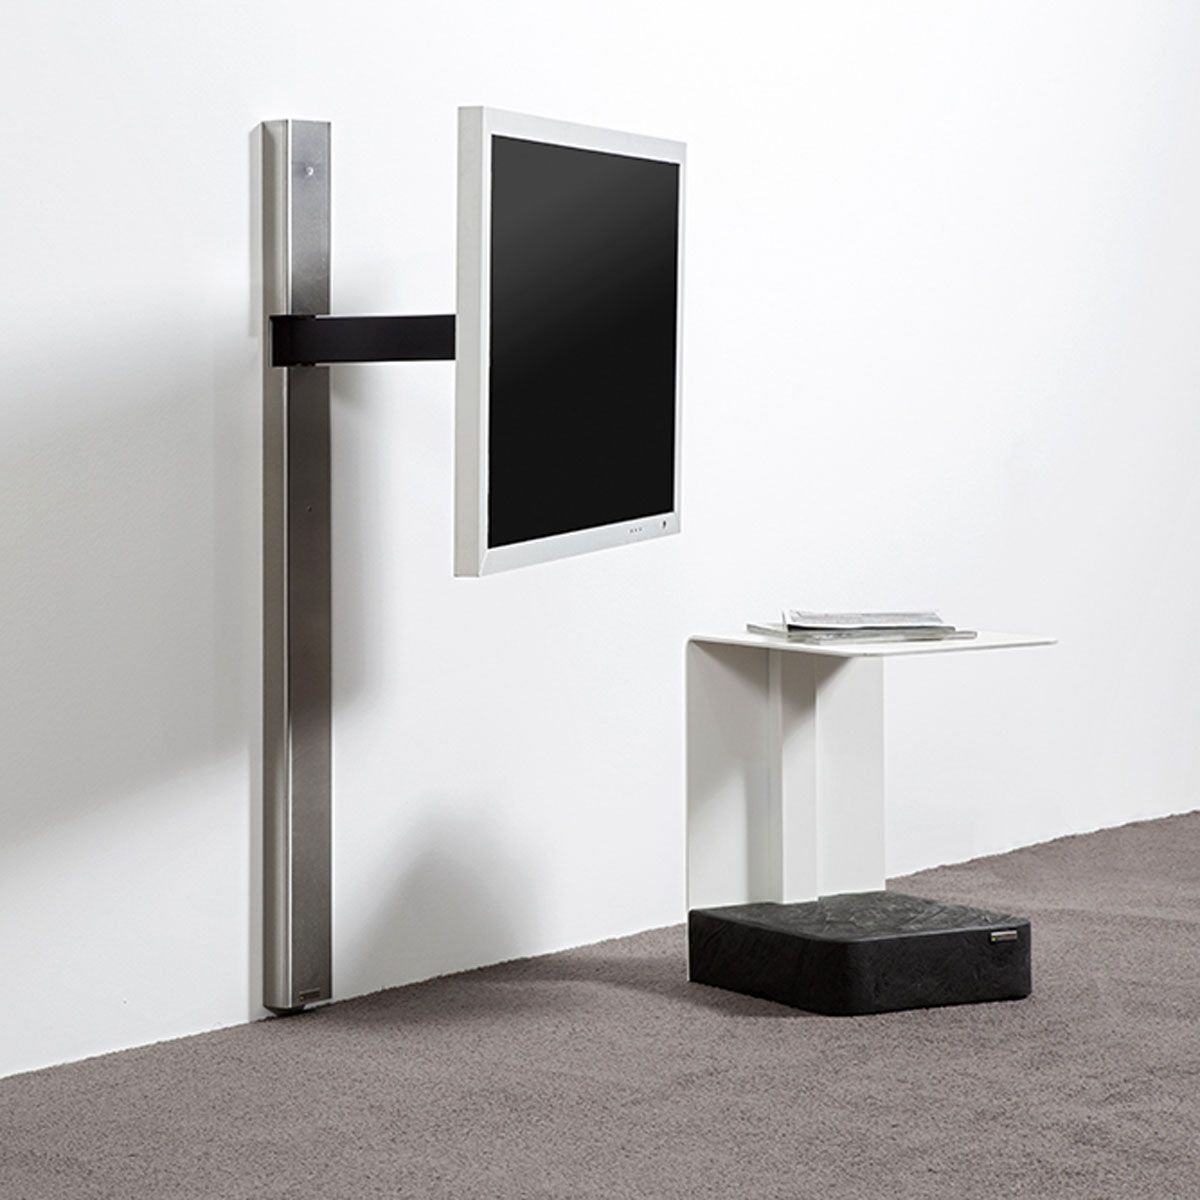 wissmann raumobjekte solution art 128 tv wandhalter bei hifi tv living room ideas. Black Bedroom Furniture Sets. Home Design Ideas